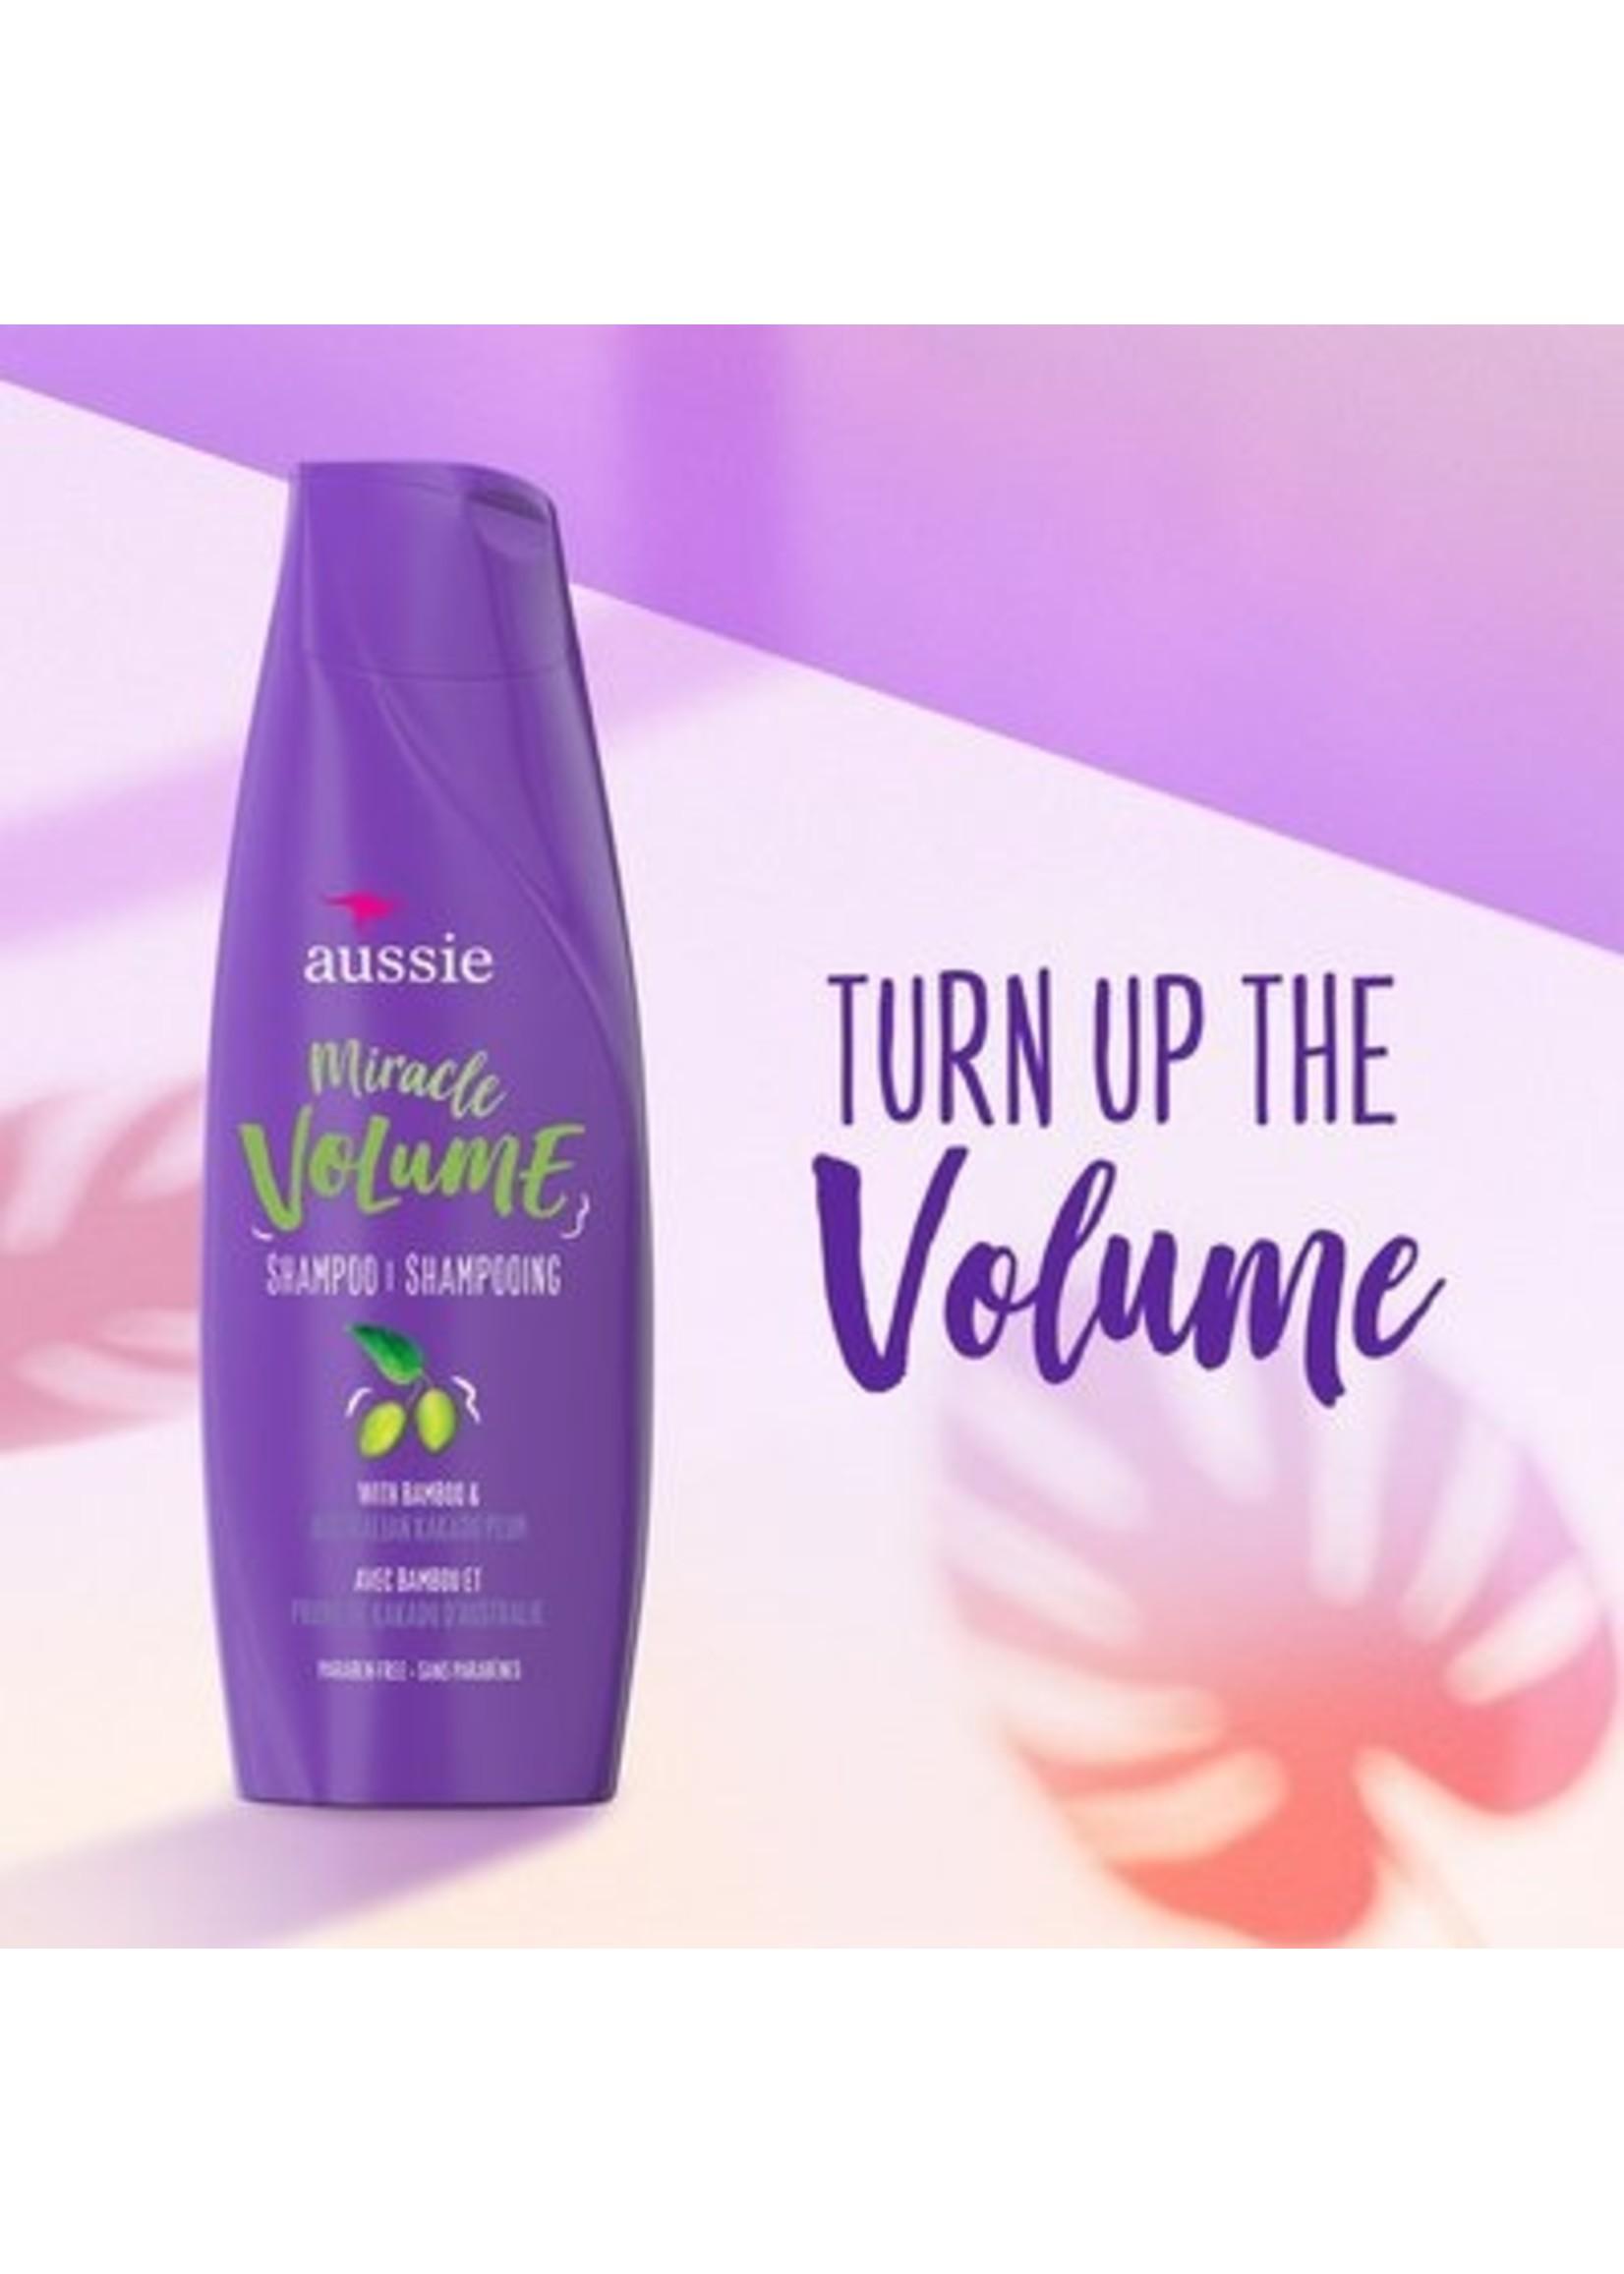 Aussie Miracle Volume Shampoo 12.1oz